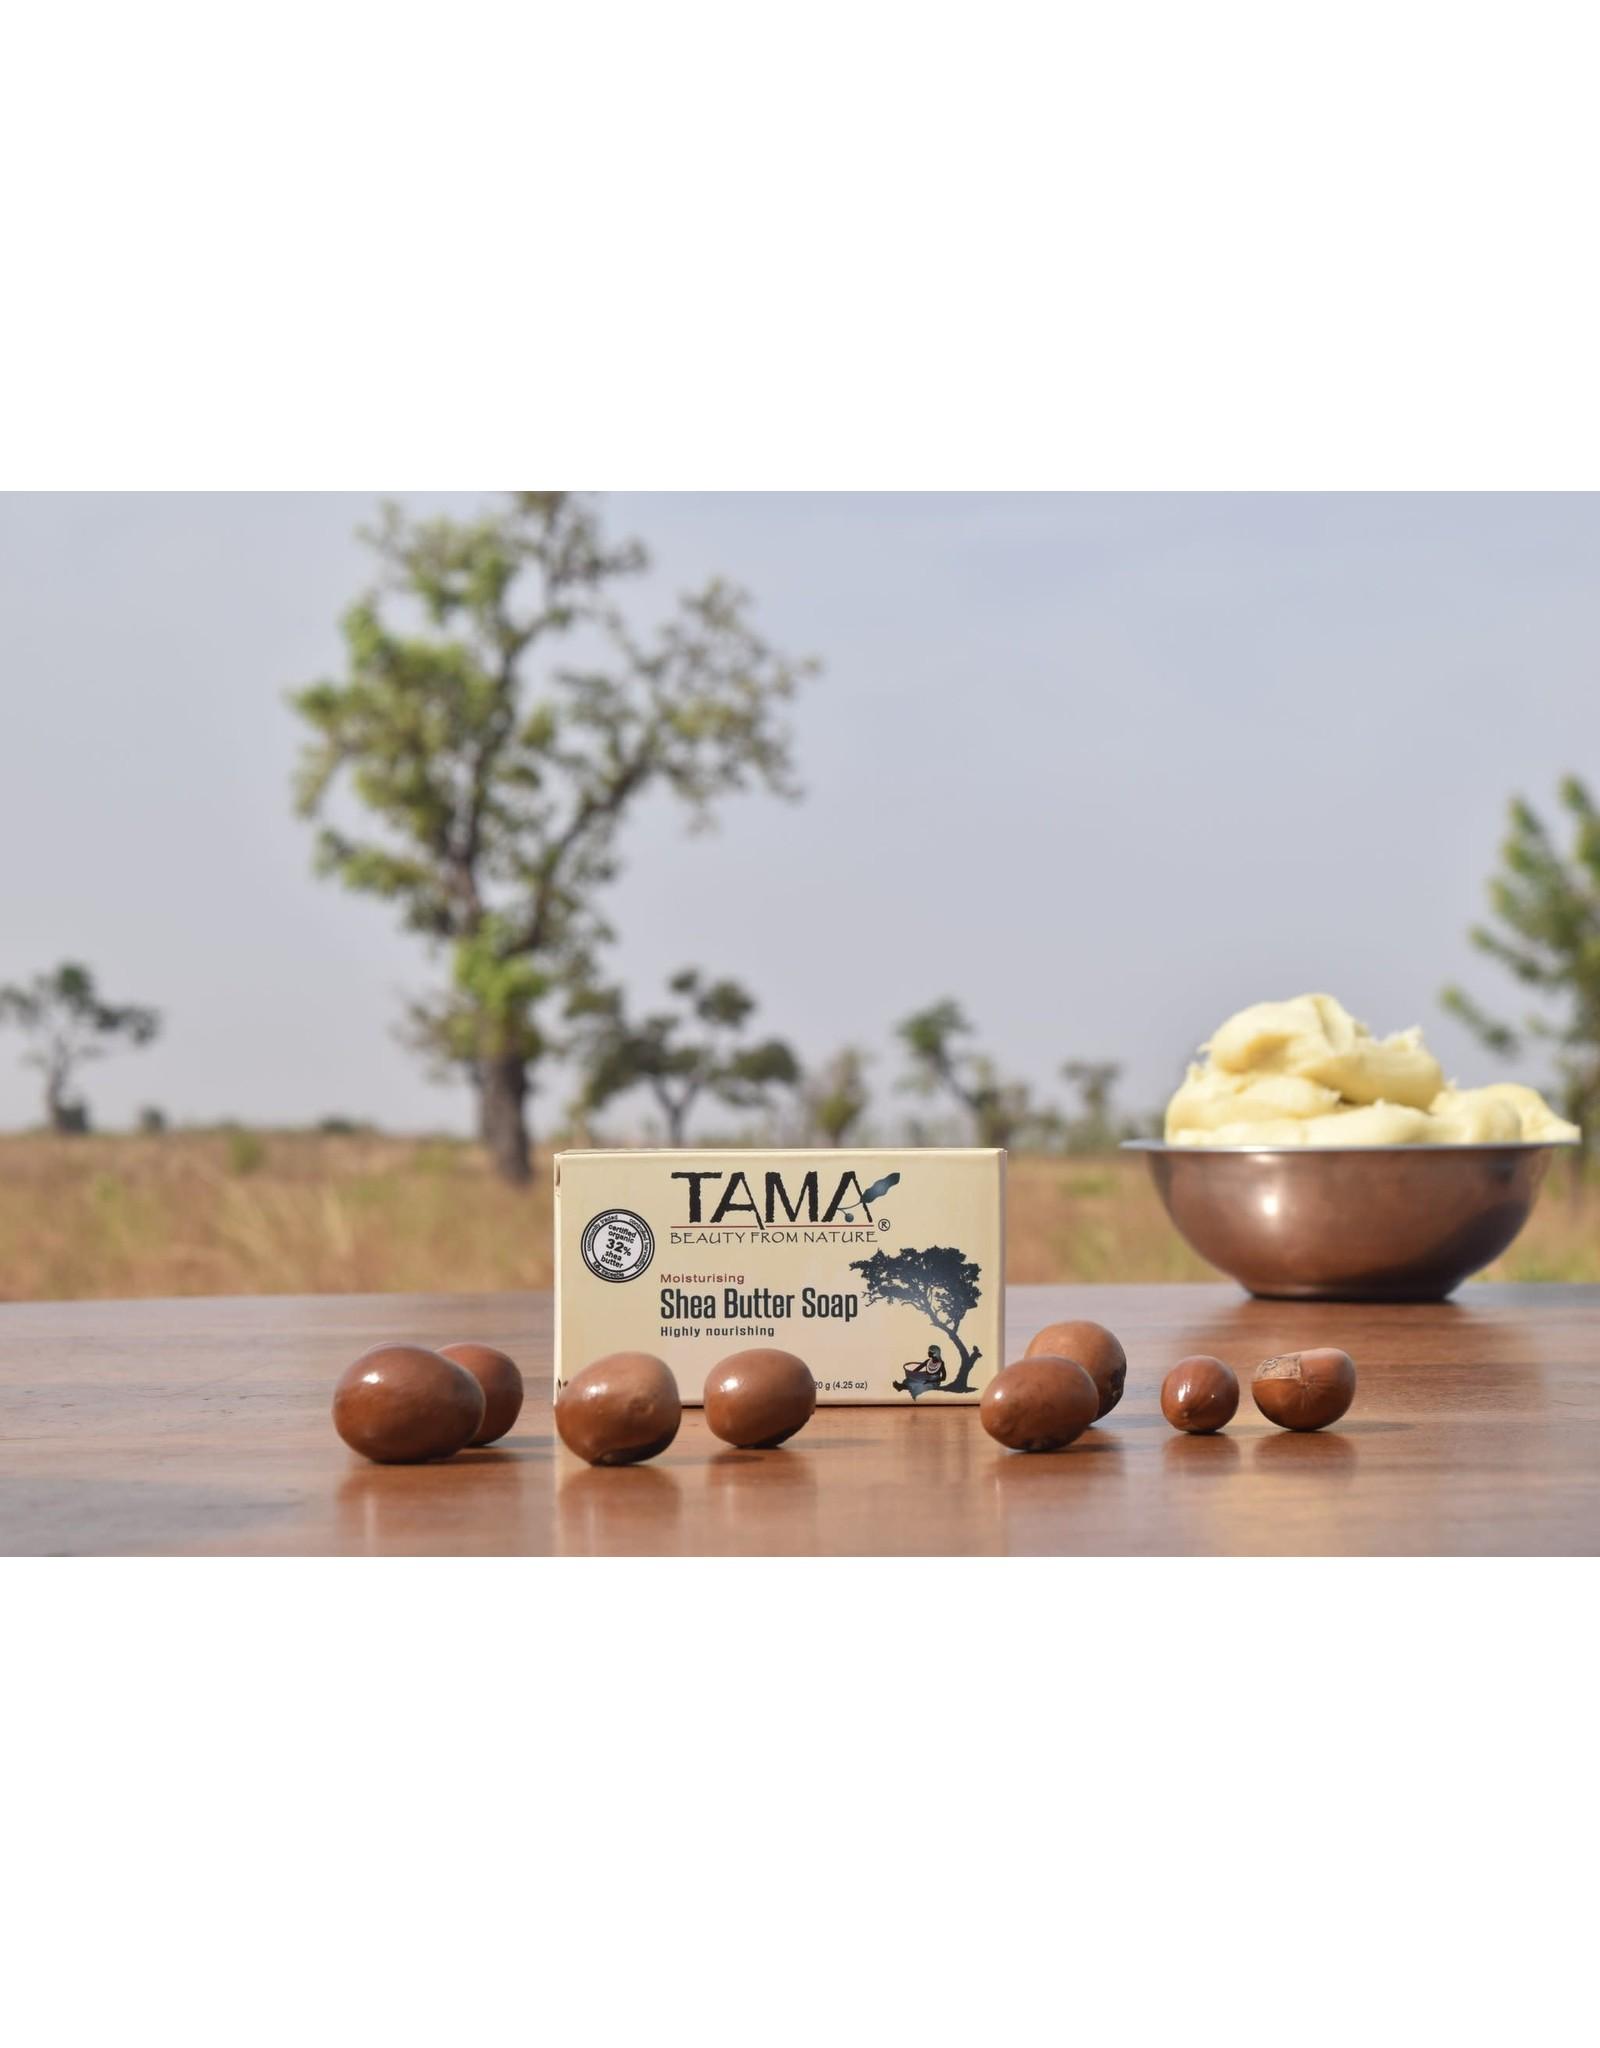 Tama Cosmetics Shea Butter Soap, Ghana